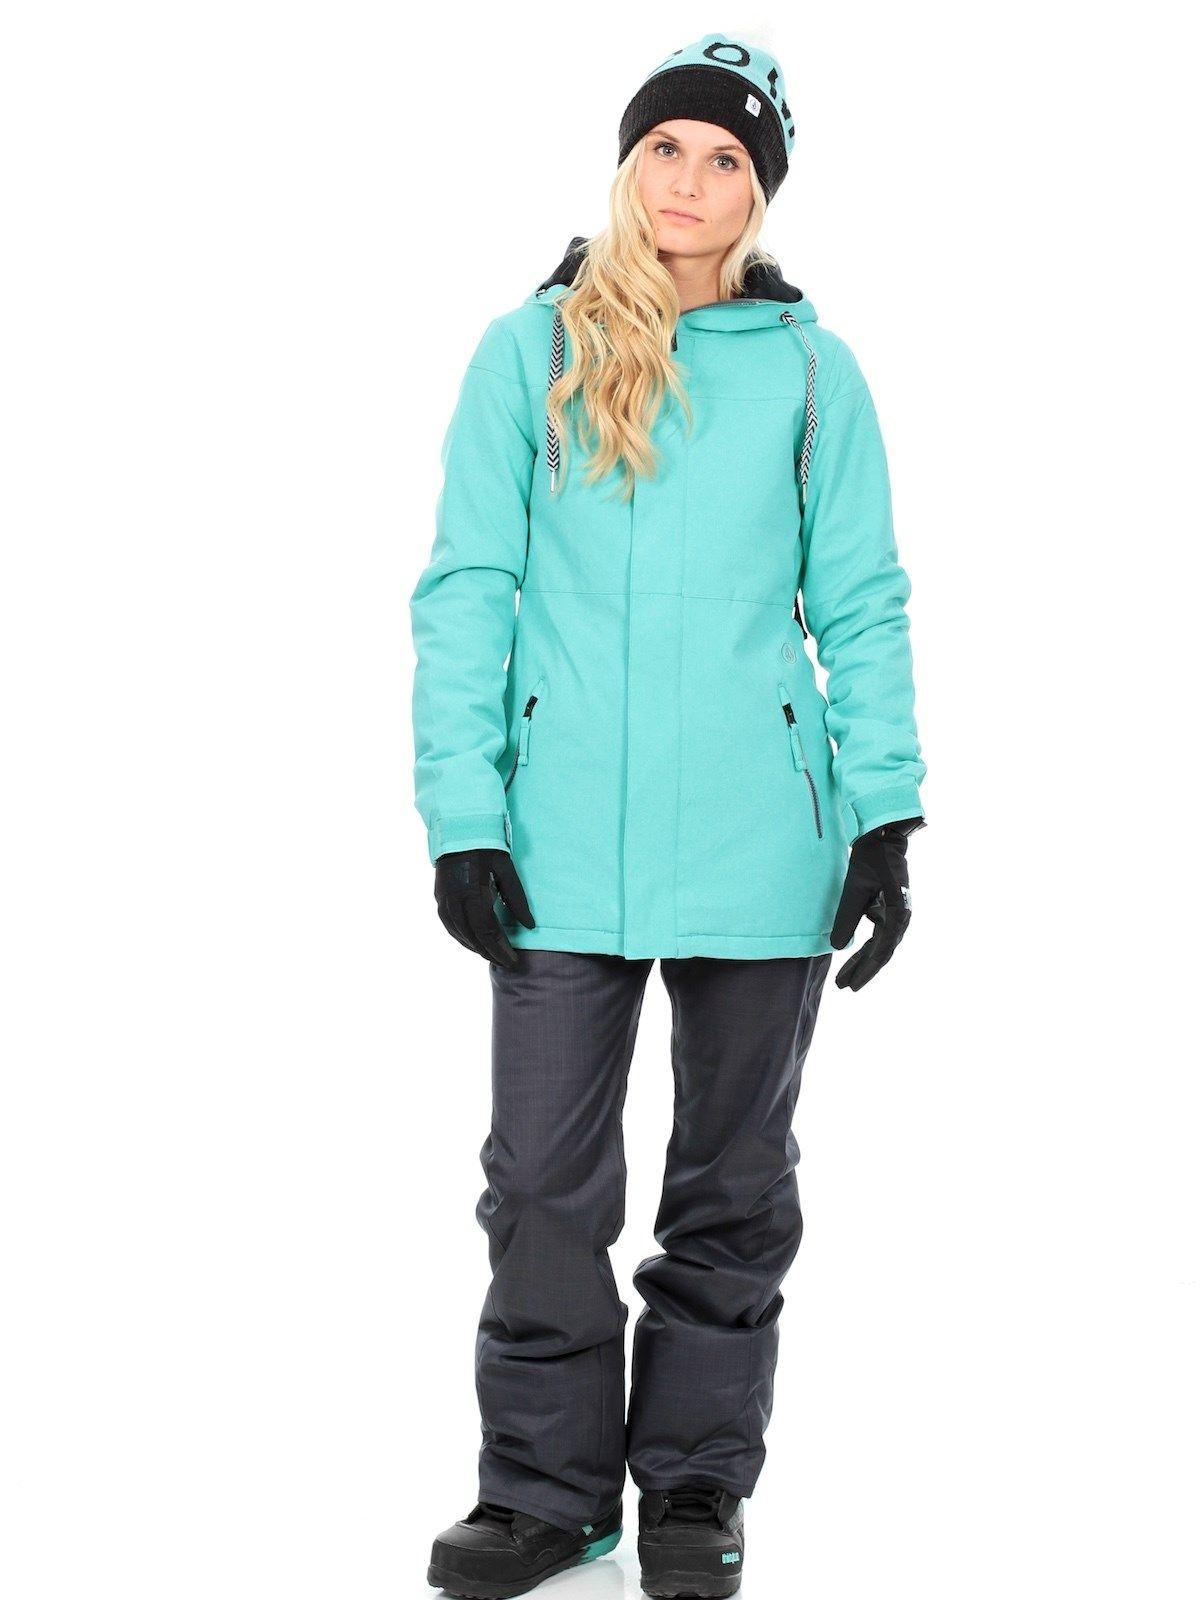 Veste snowboard femme longue